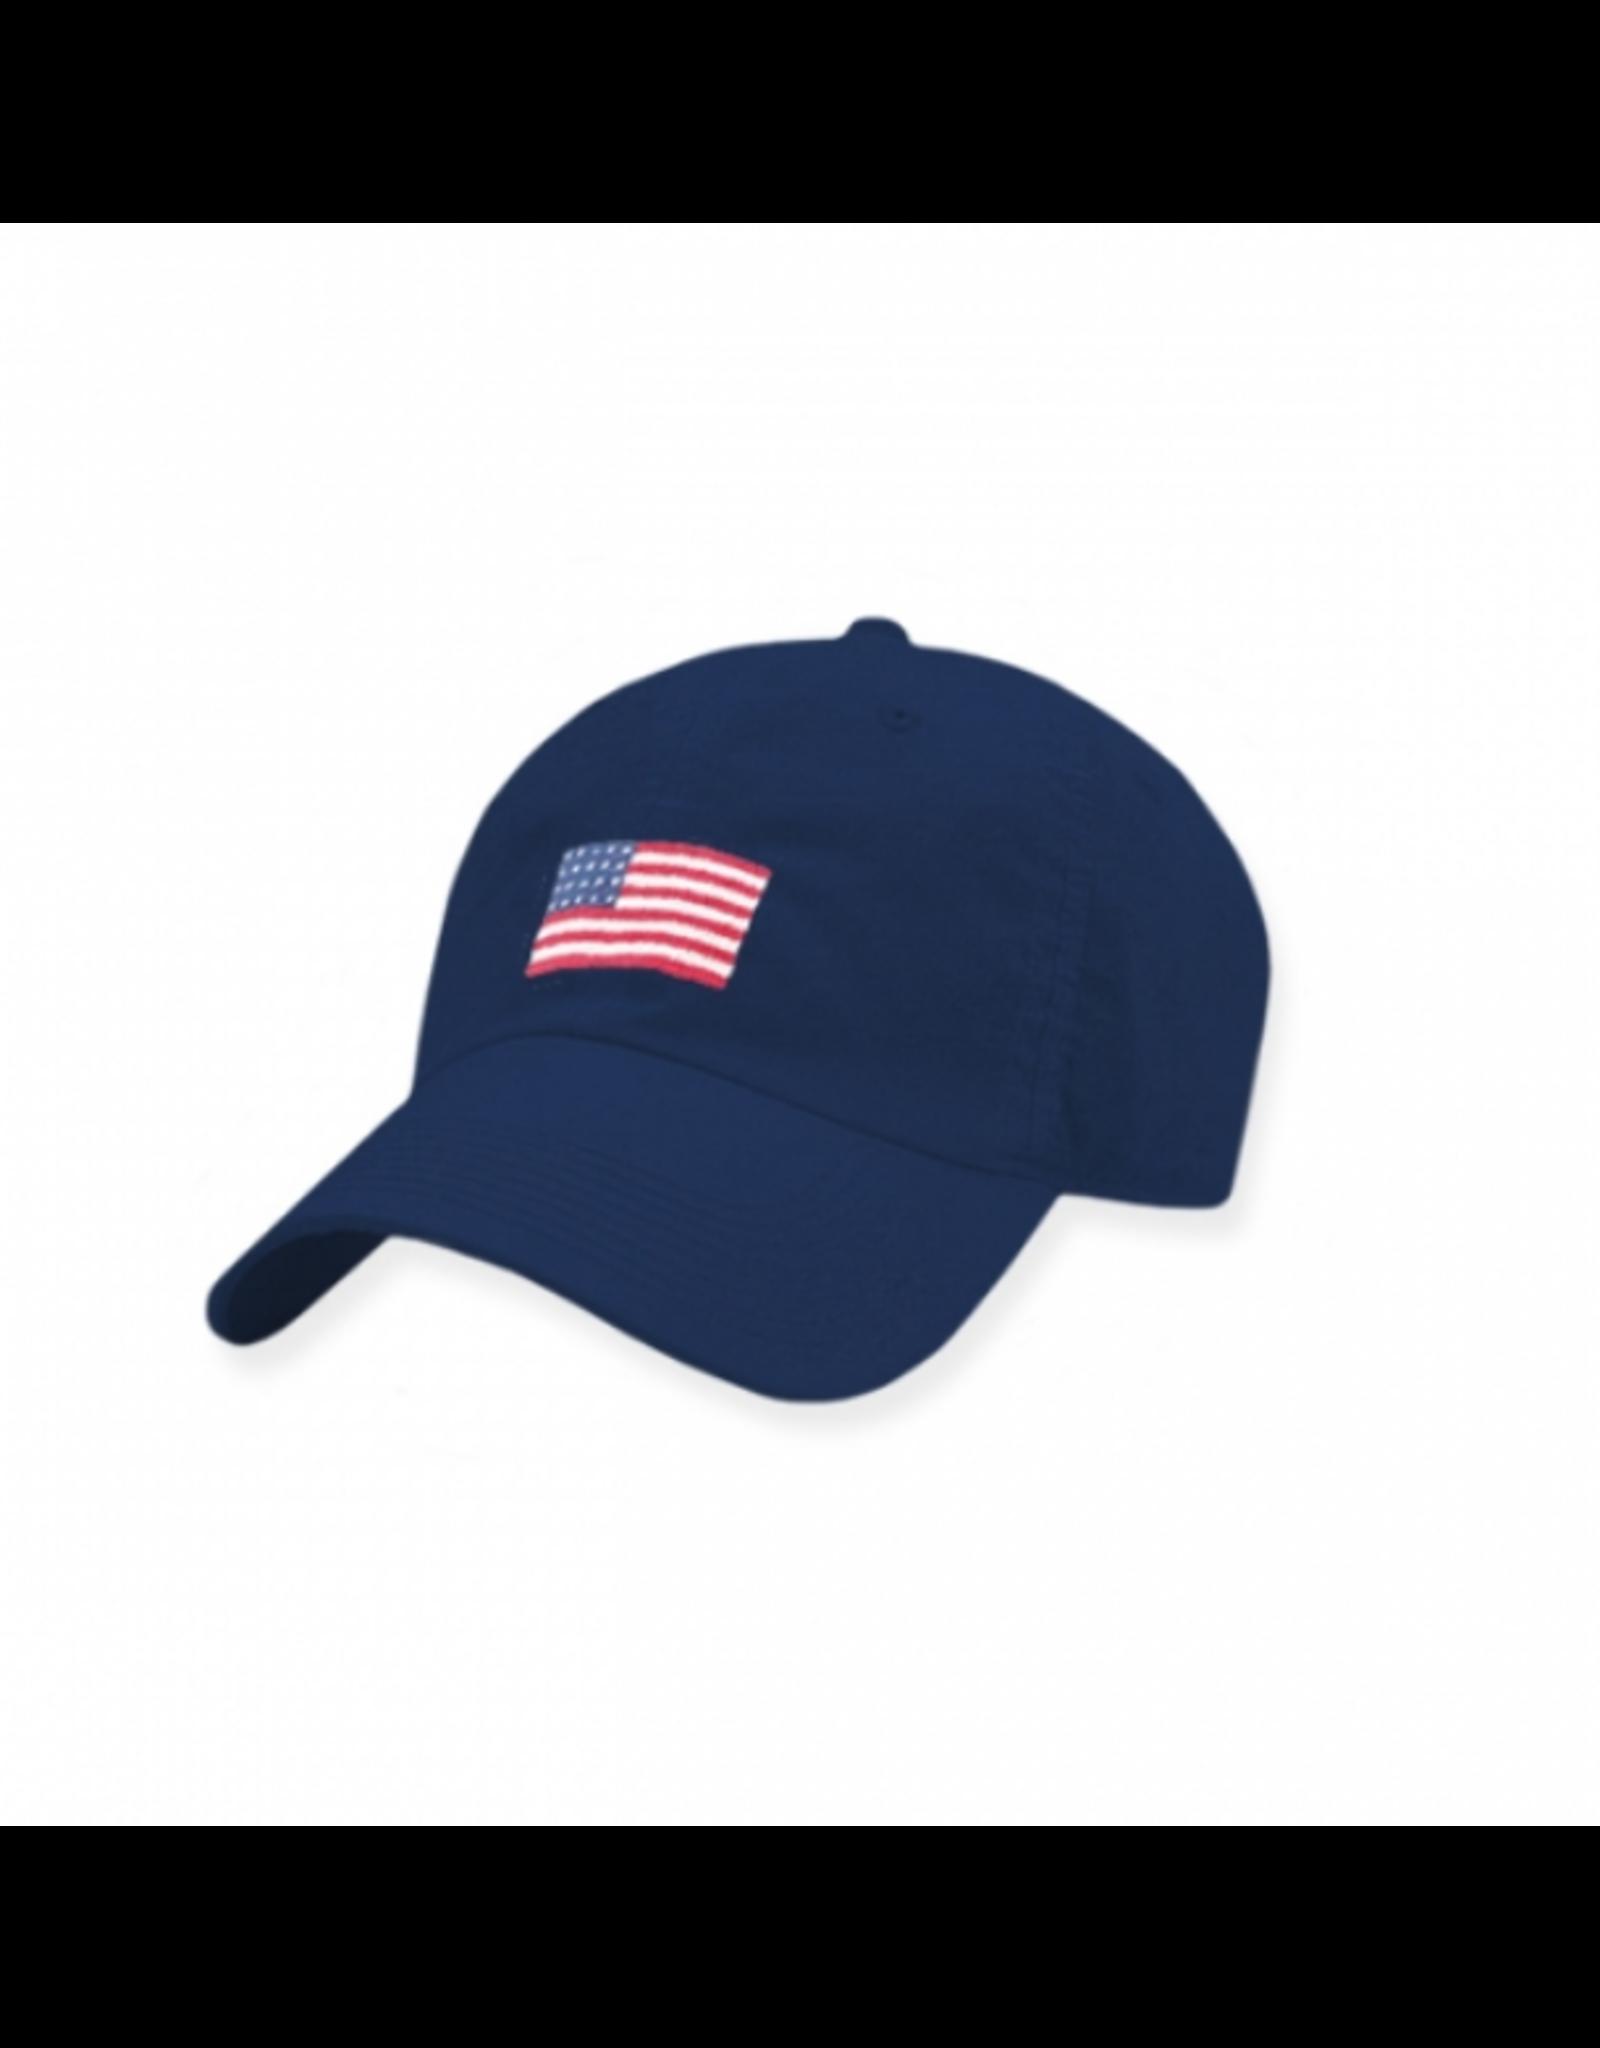 Smathers & Branson S&B Needlepoint Ball Hat, American Flag on Navy